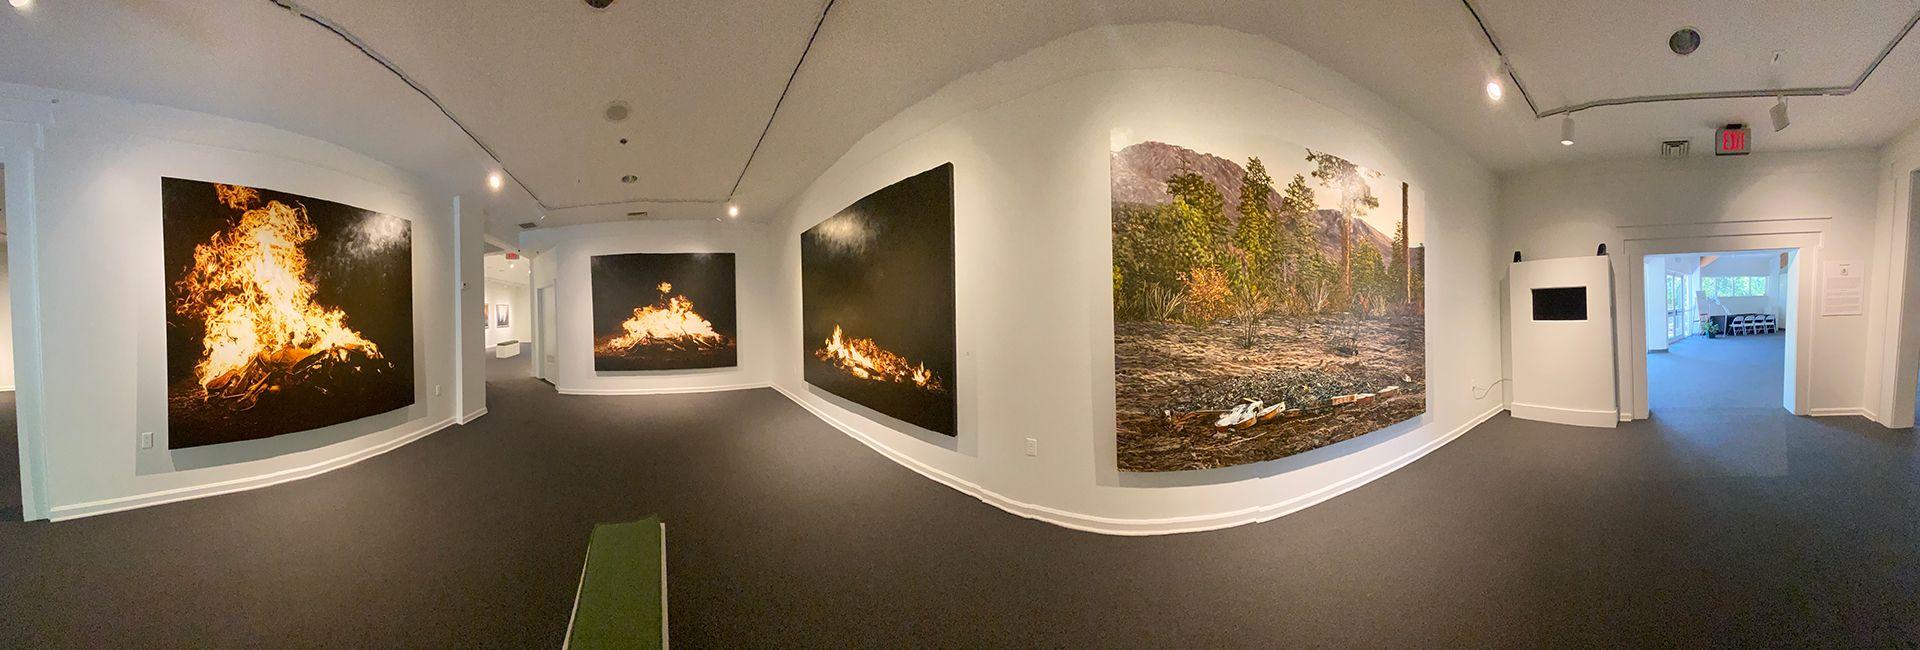 Virtual Exhibits